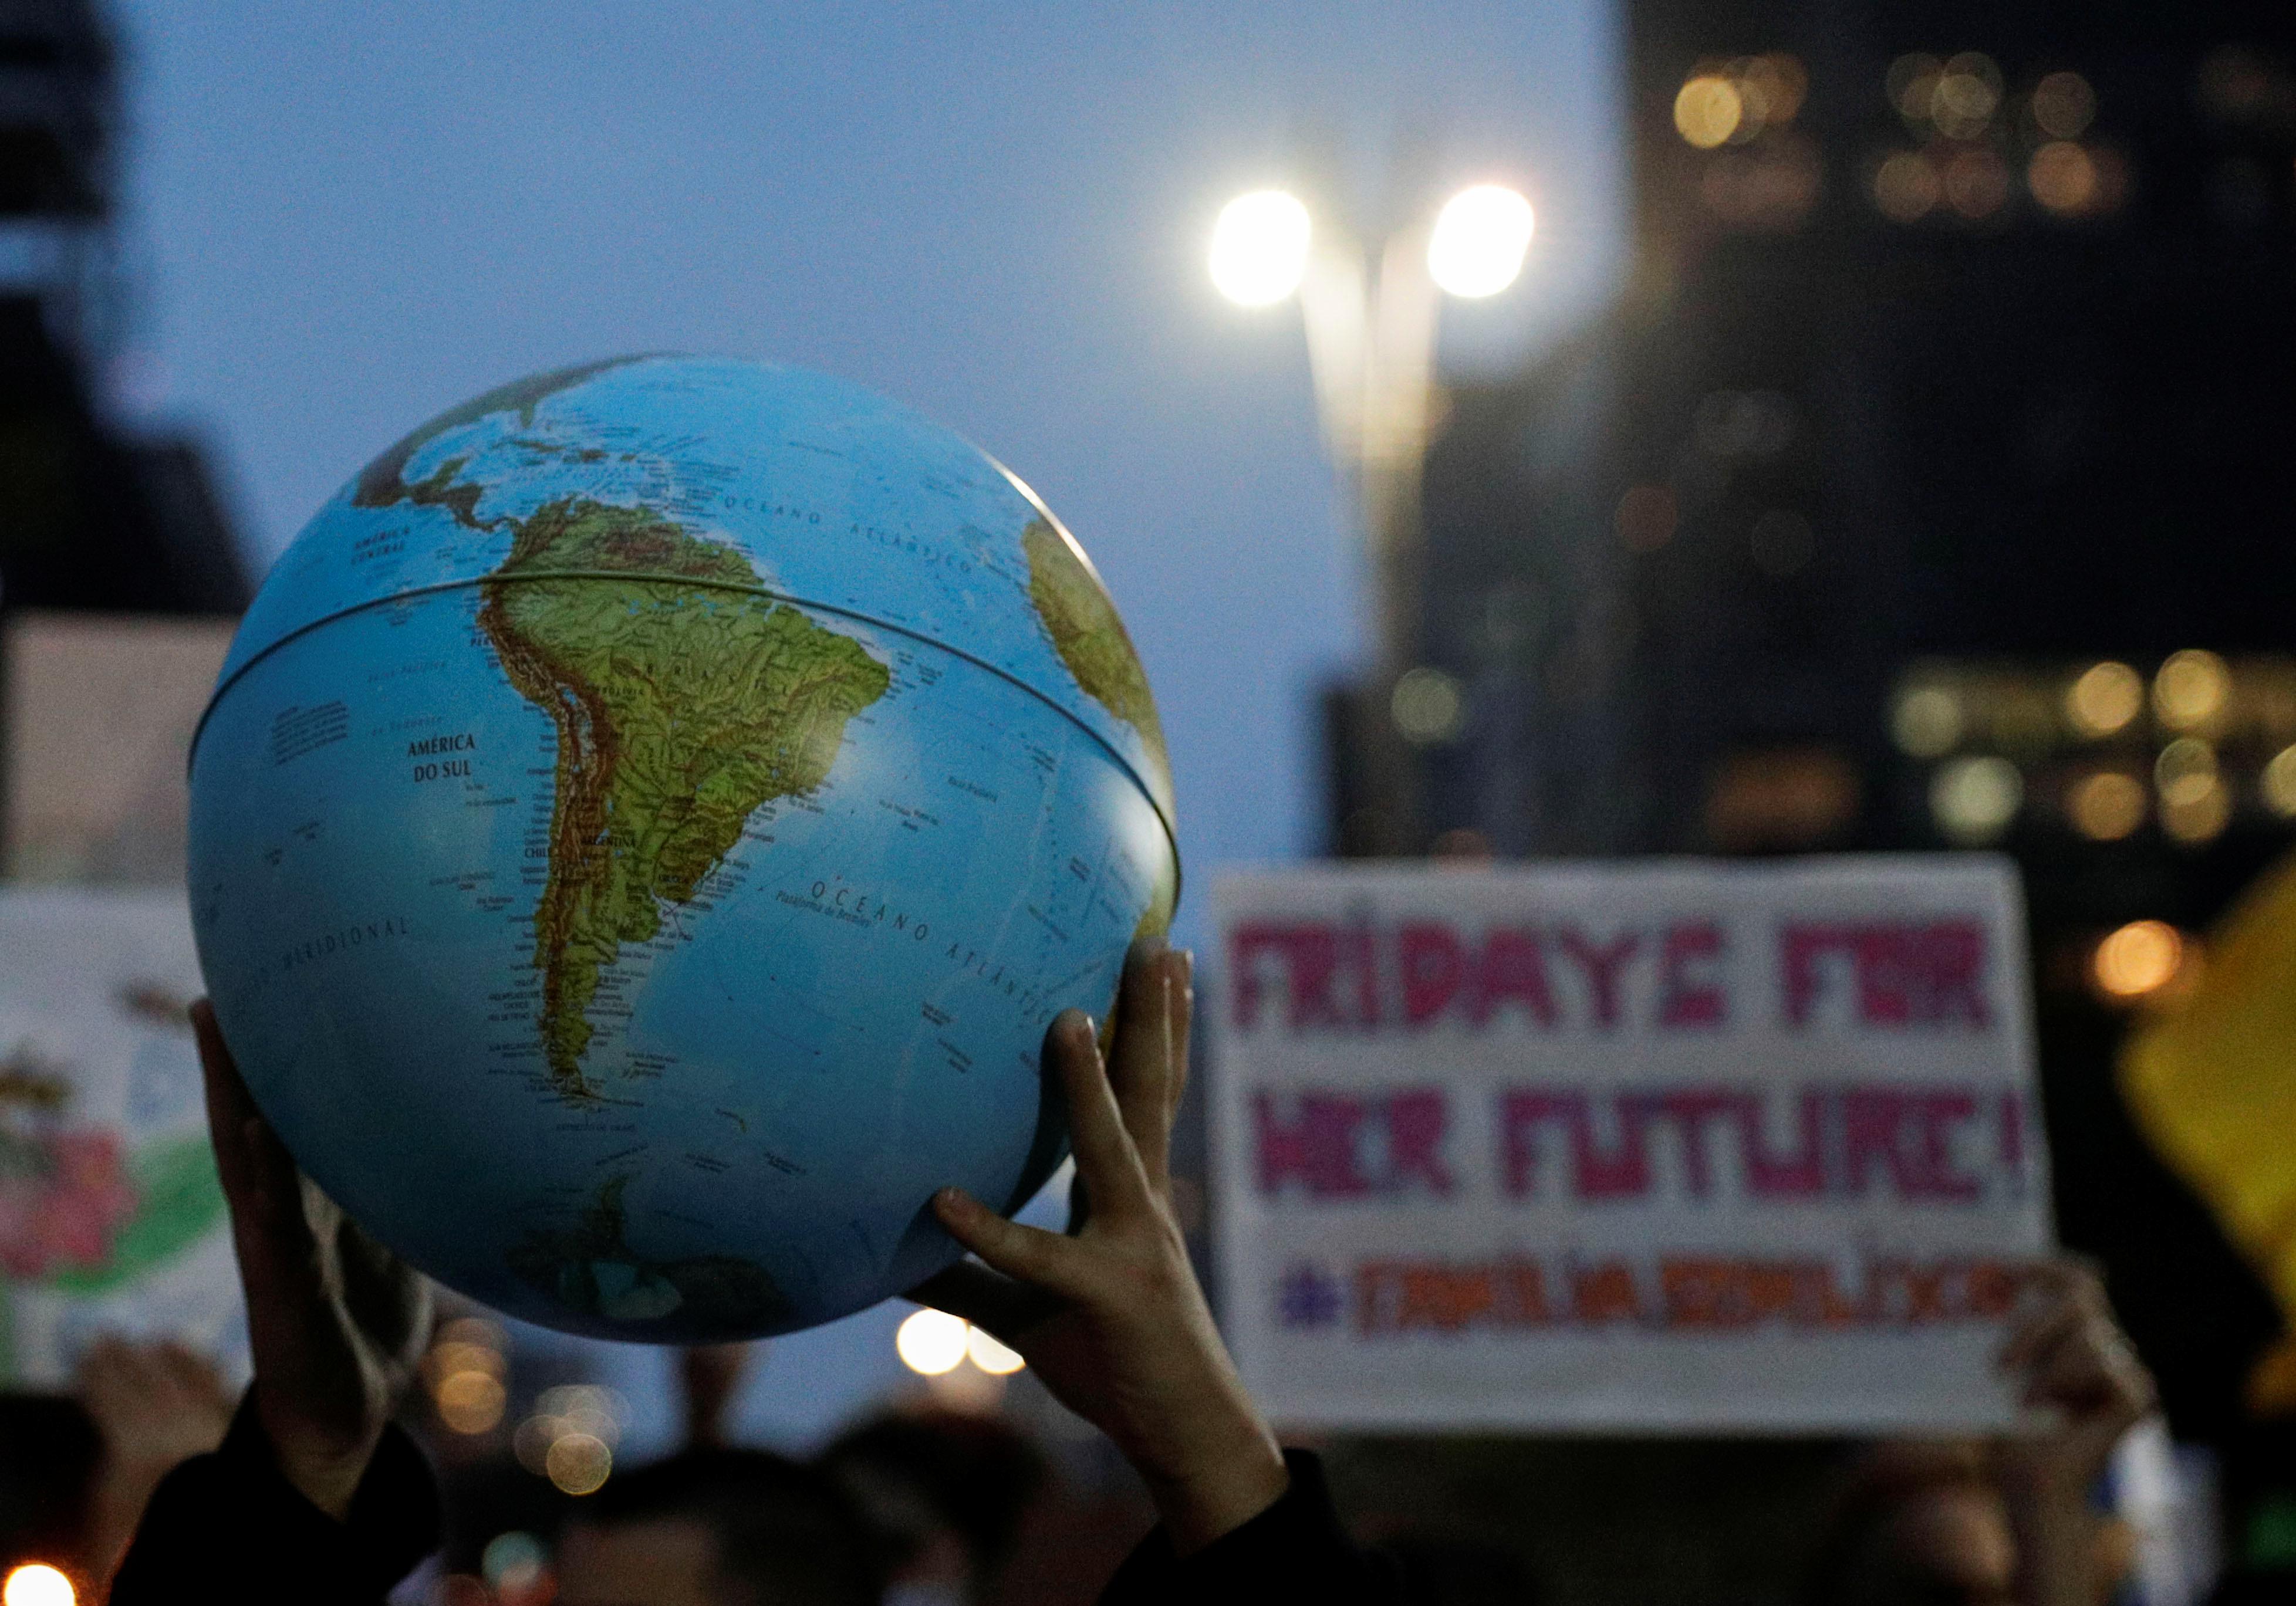 Brazilian climate strikers take aim at Bolsonaro for Amazon fires